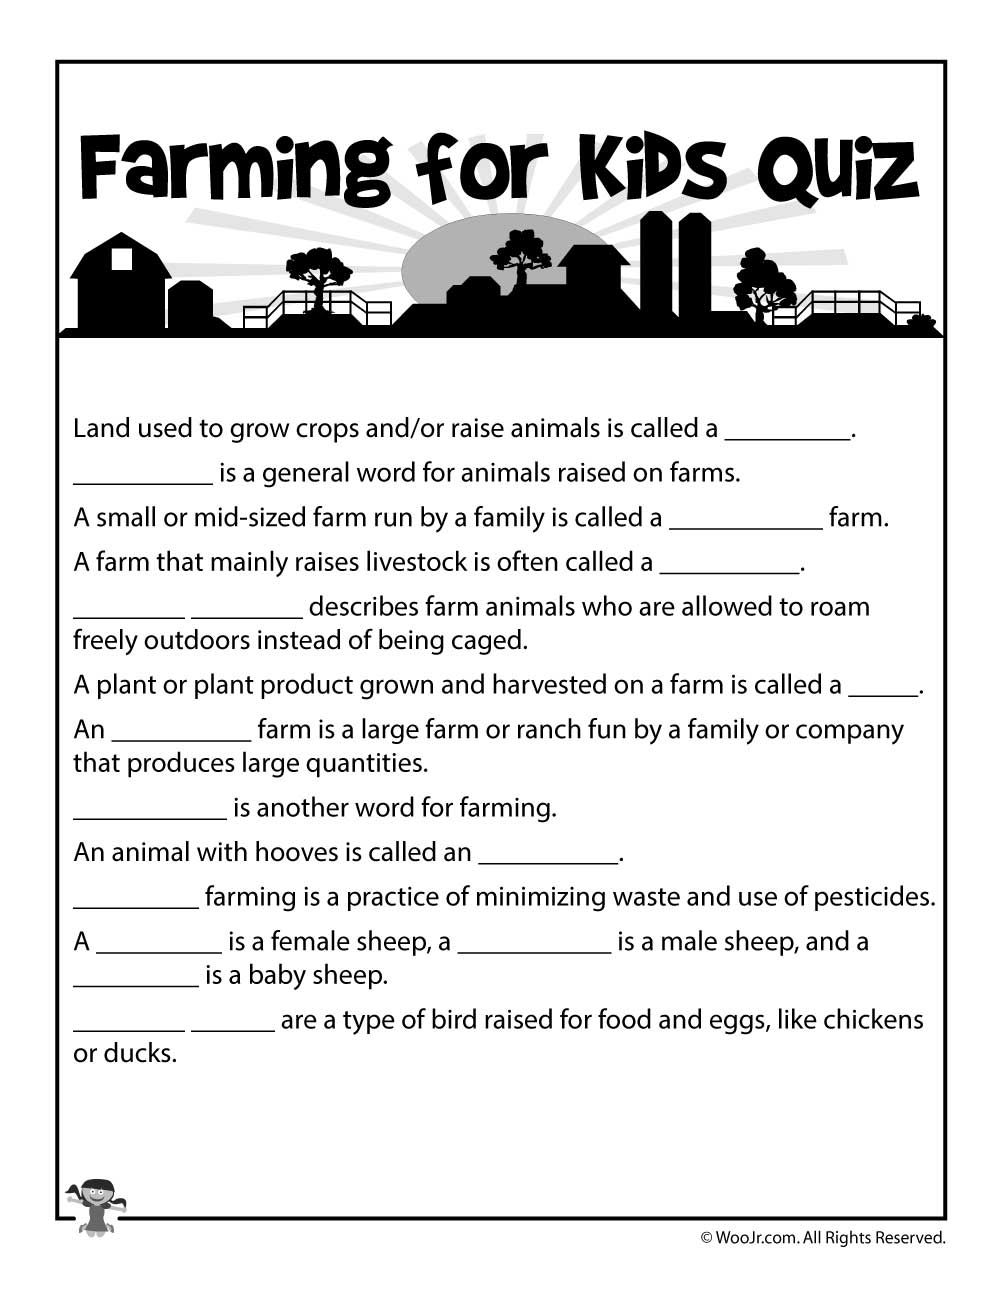 list of farming activities